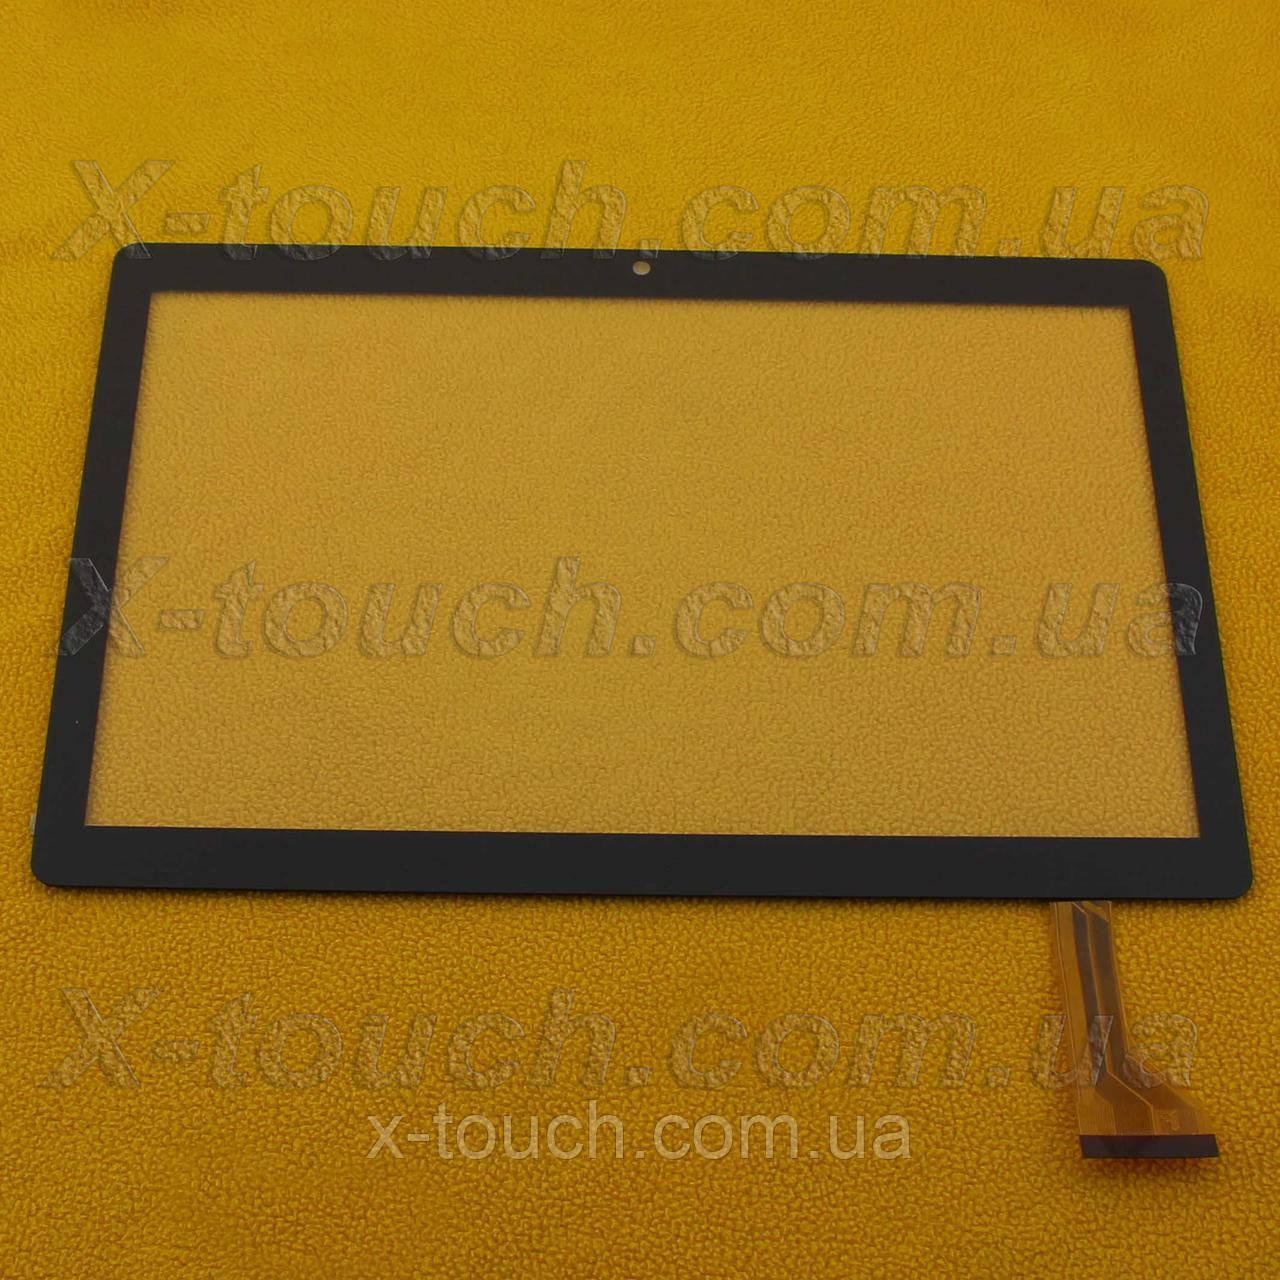 Cенсор, тачскрин FFV10-B SLR черного цвета